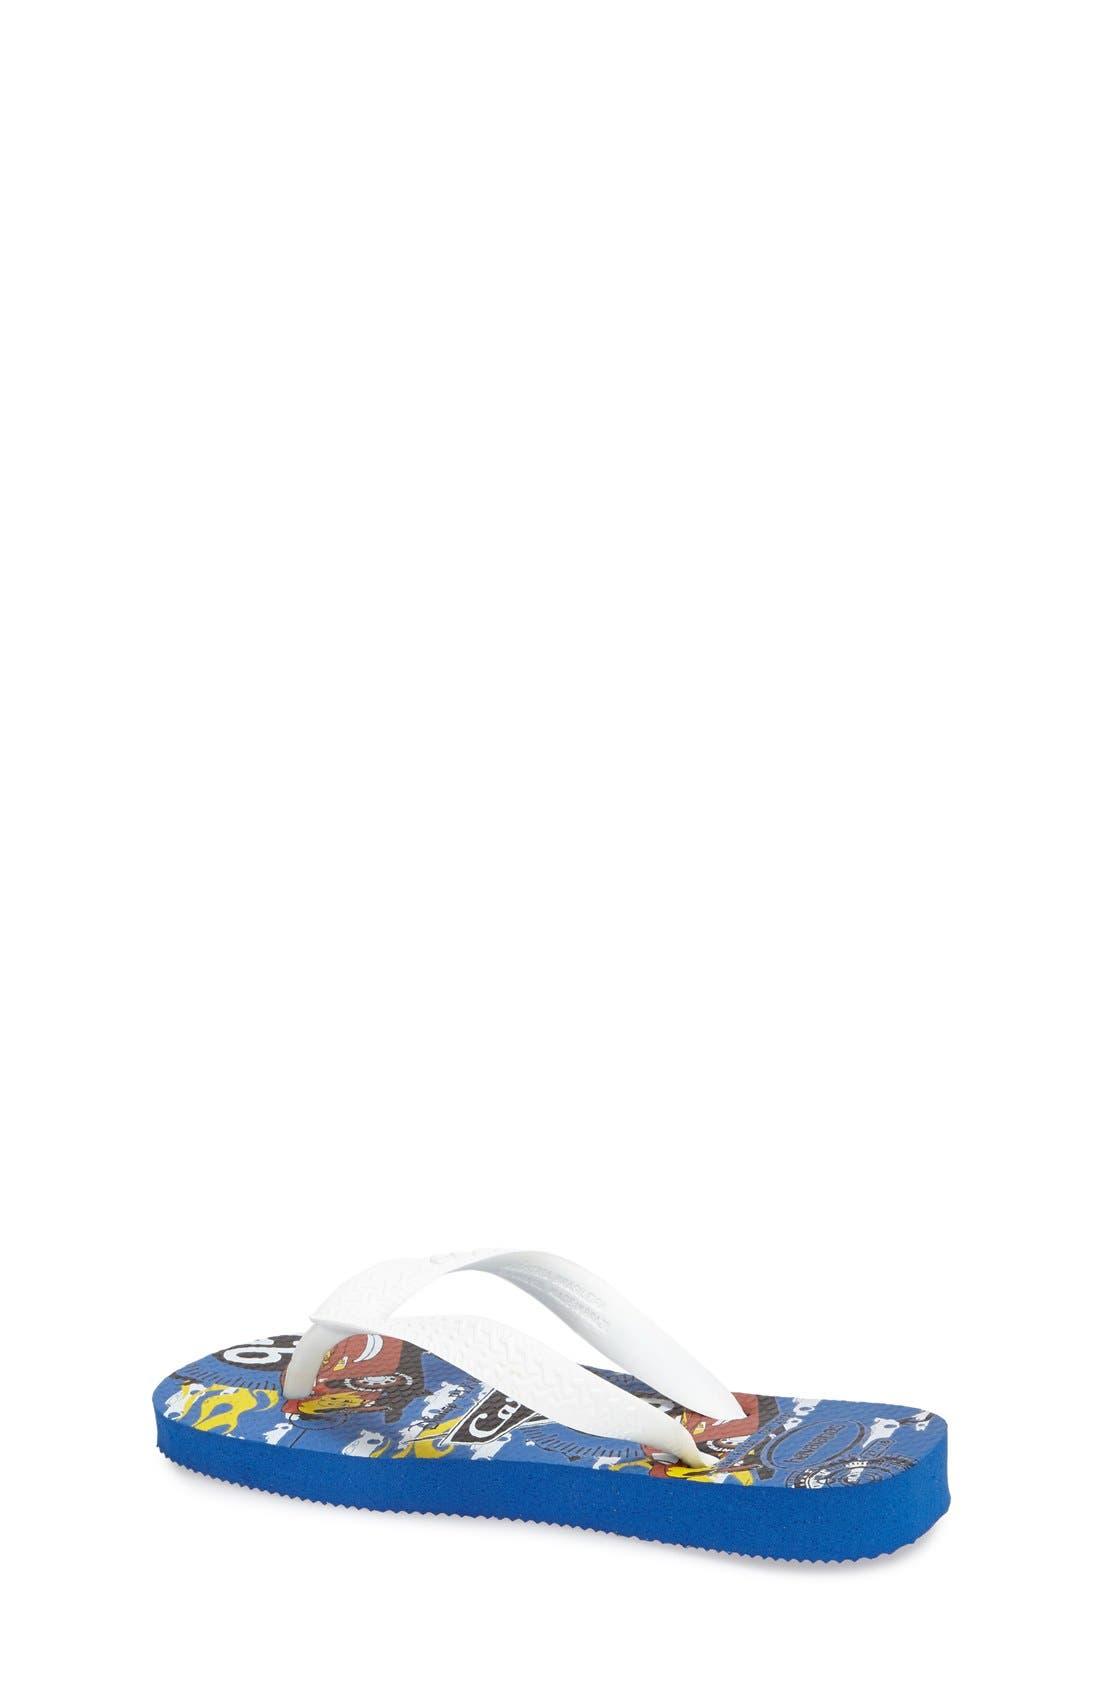 Alternate Image 2  - Havaianas 'Cars®' Flip Flops (Toddler, Little Kid & Big Kid)